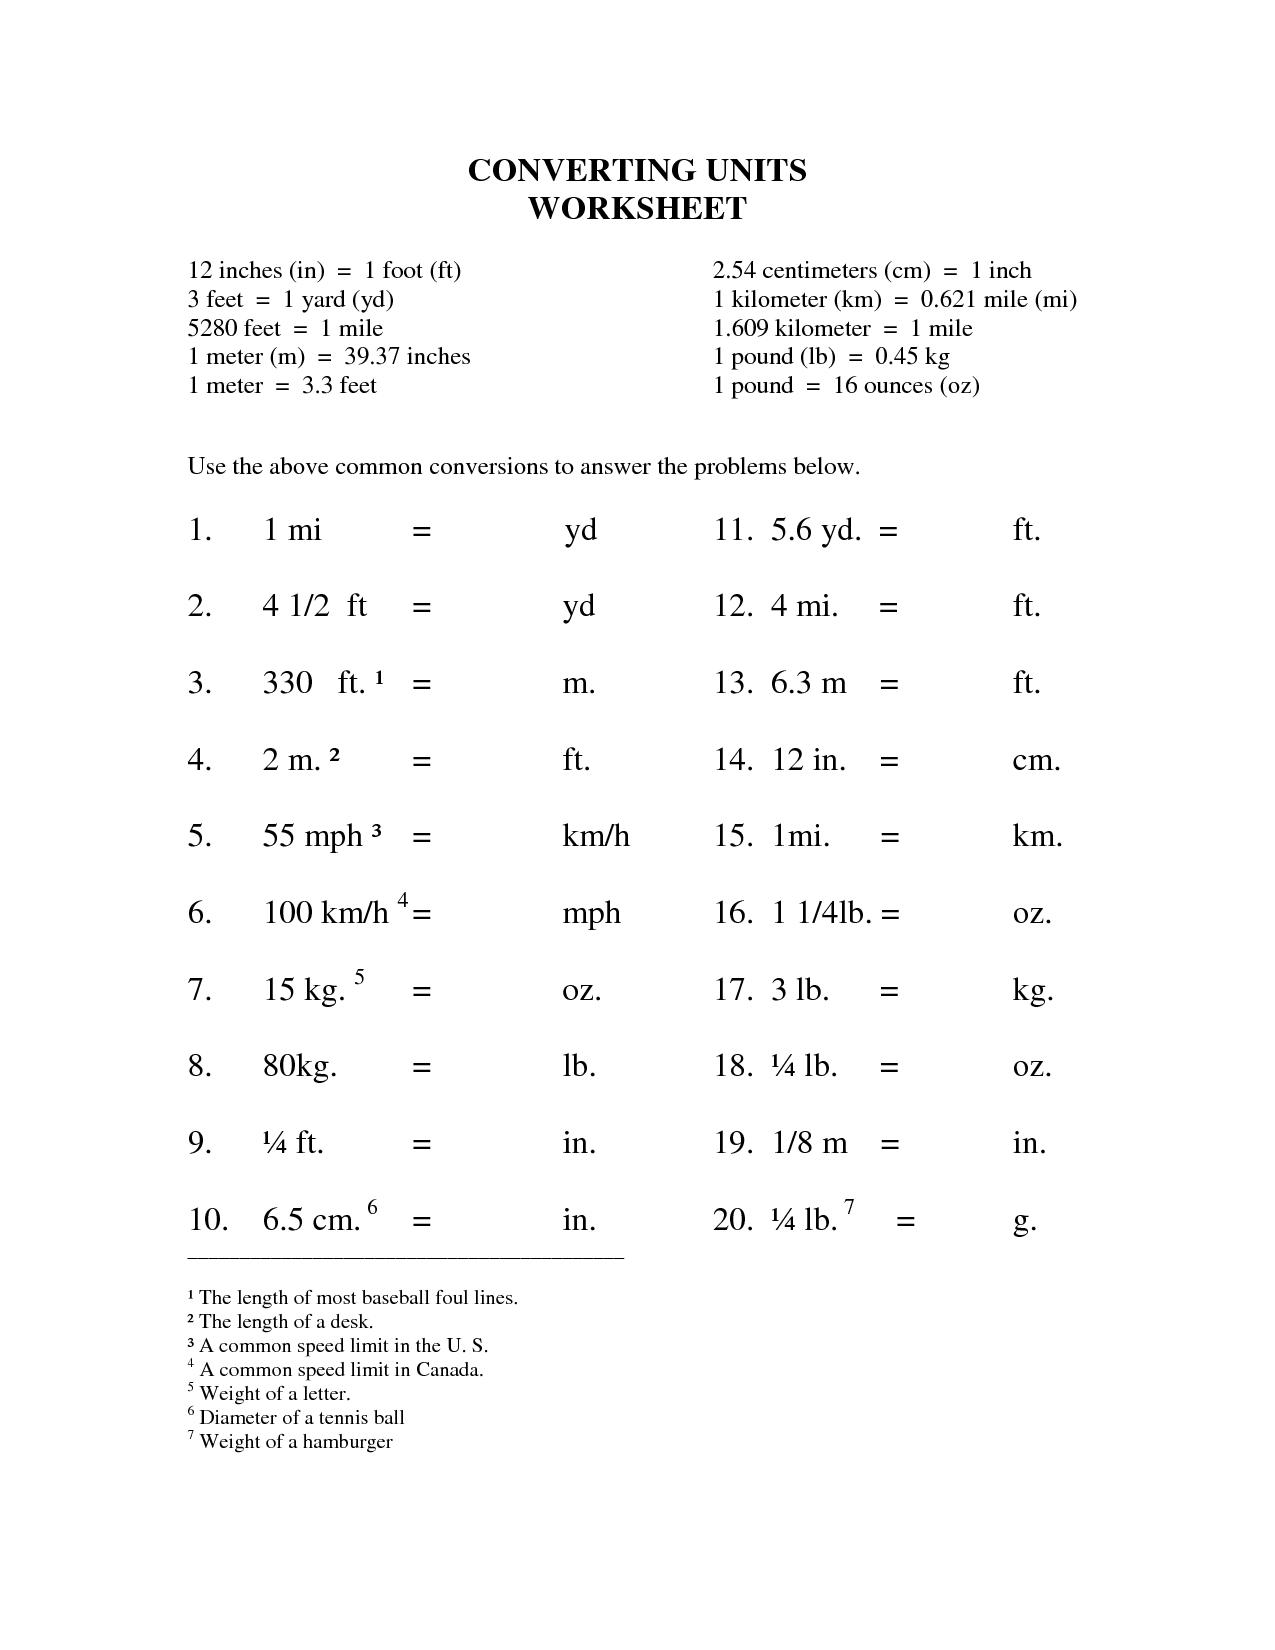 Unit Conversions Worksheet Algebra